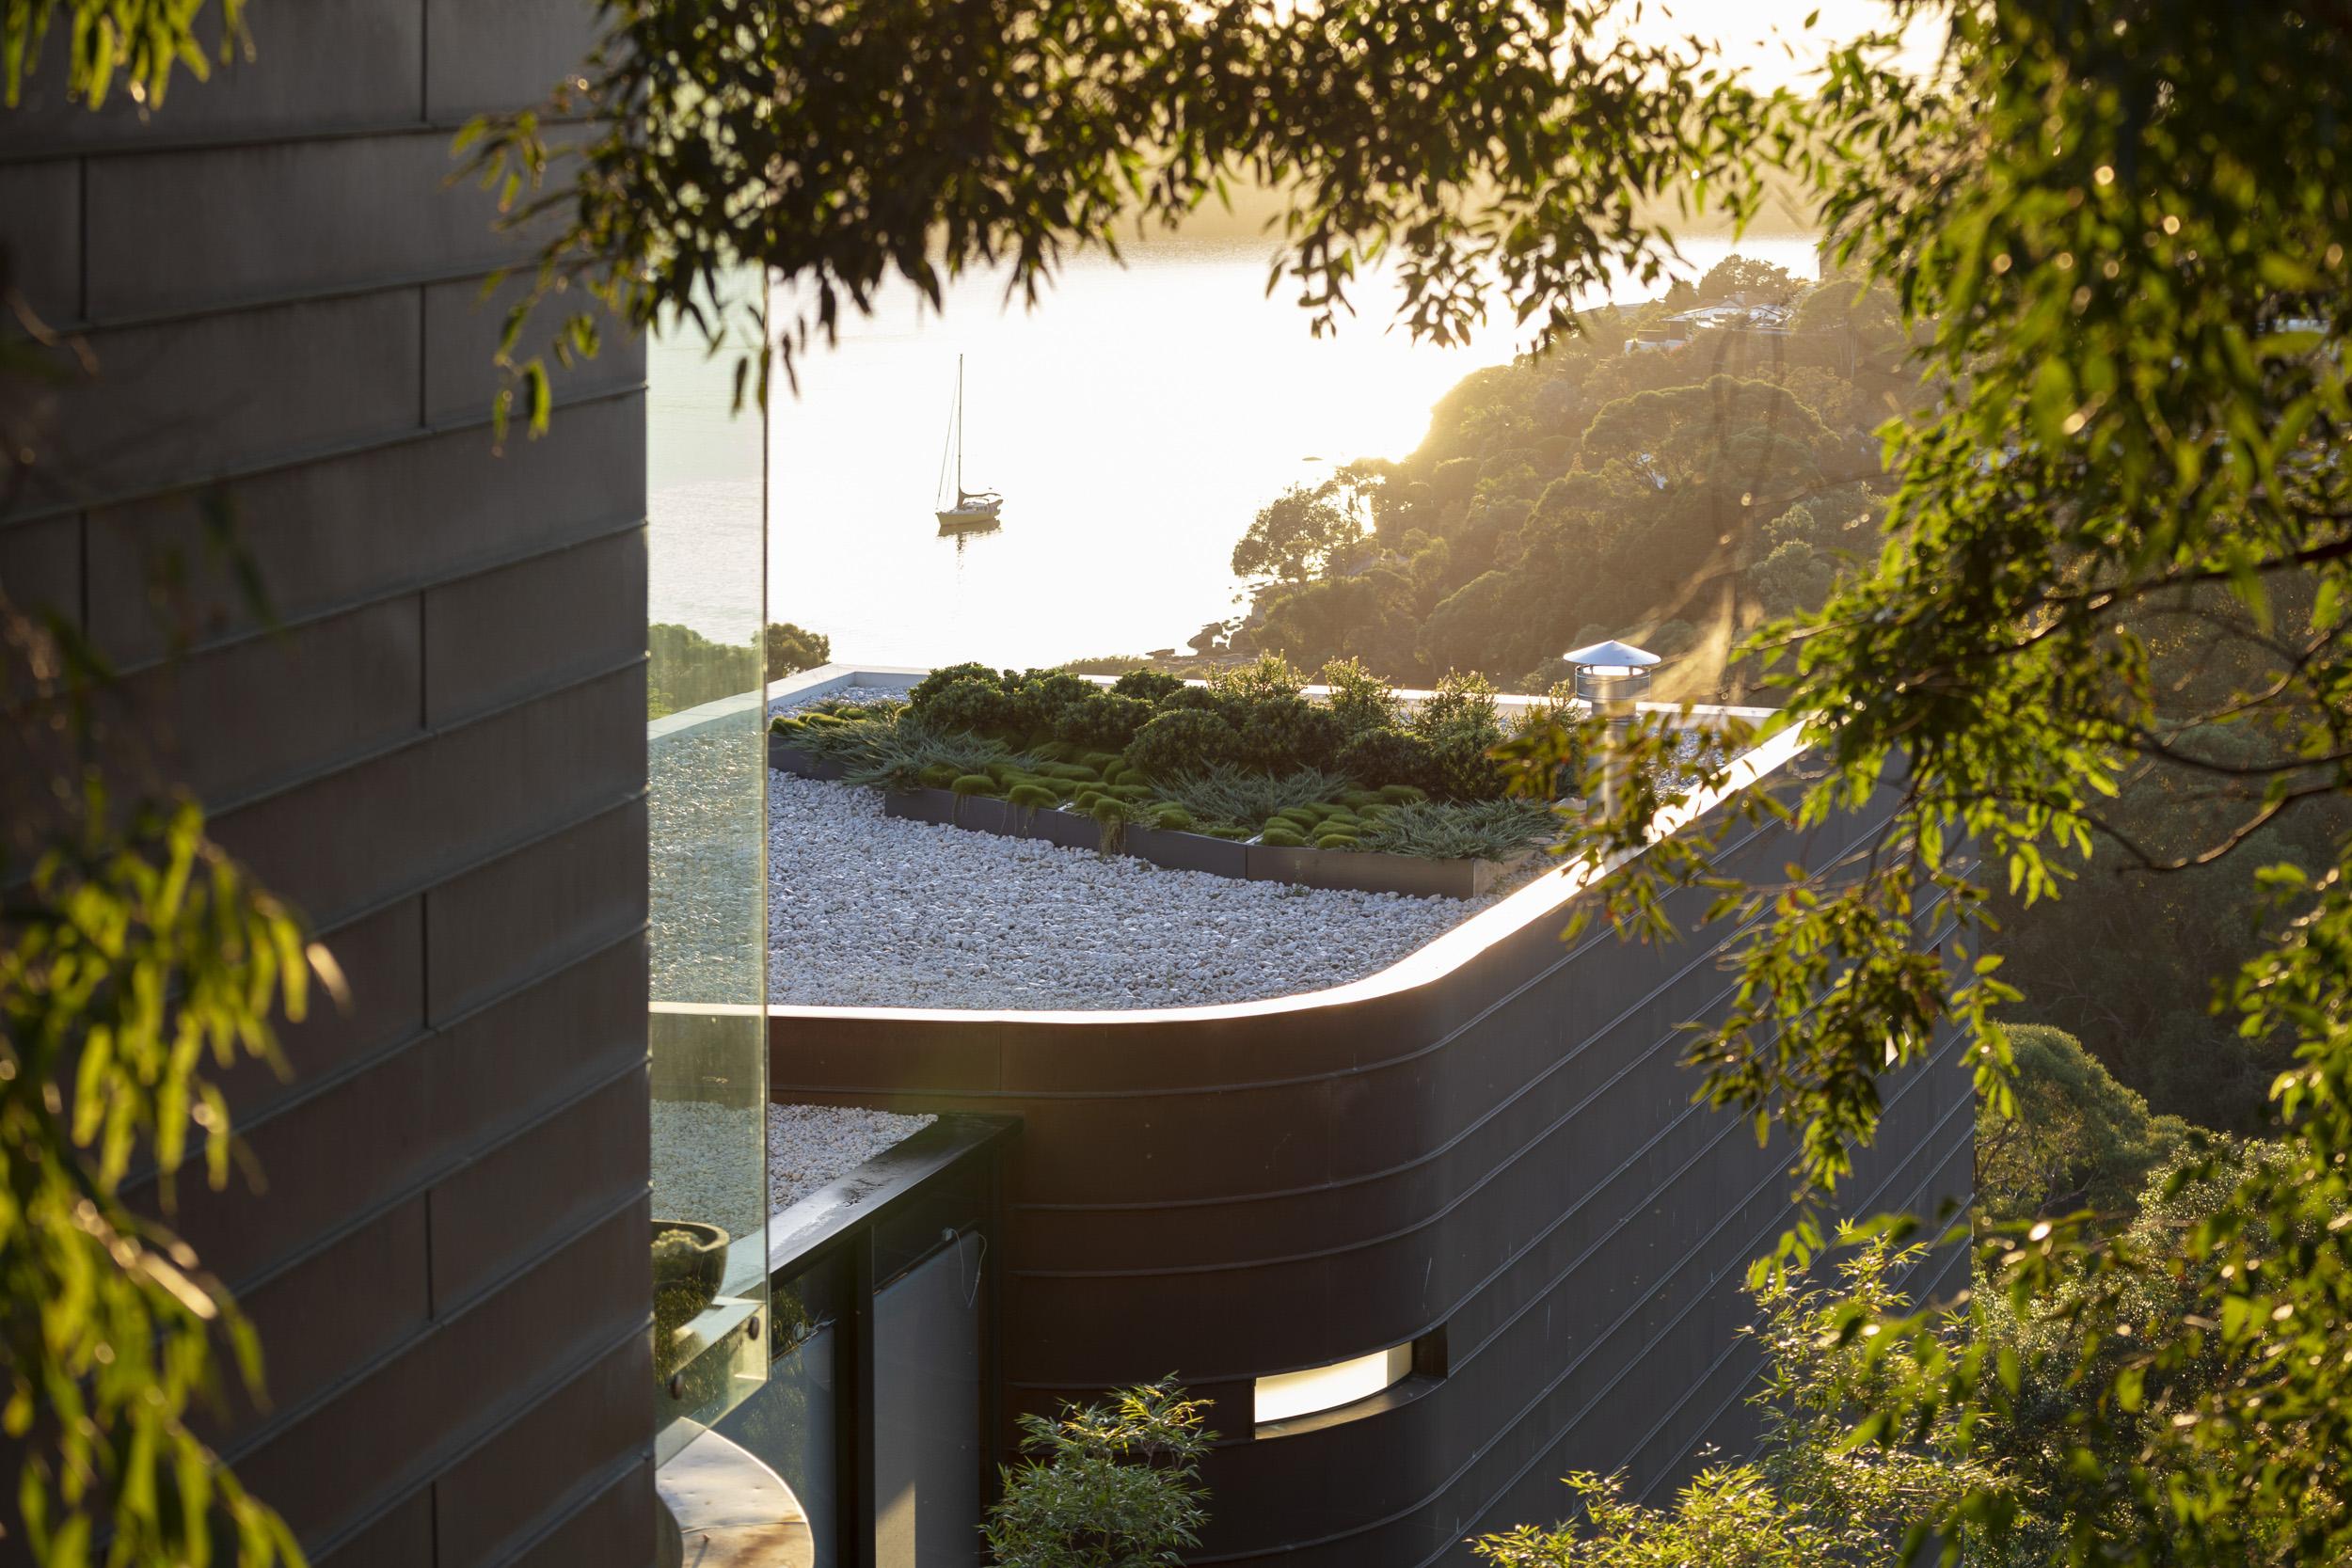 residential_architect_photographer_sydney_05.jpg